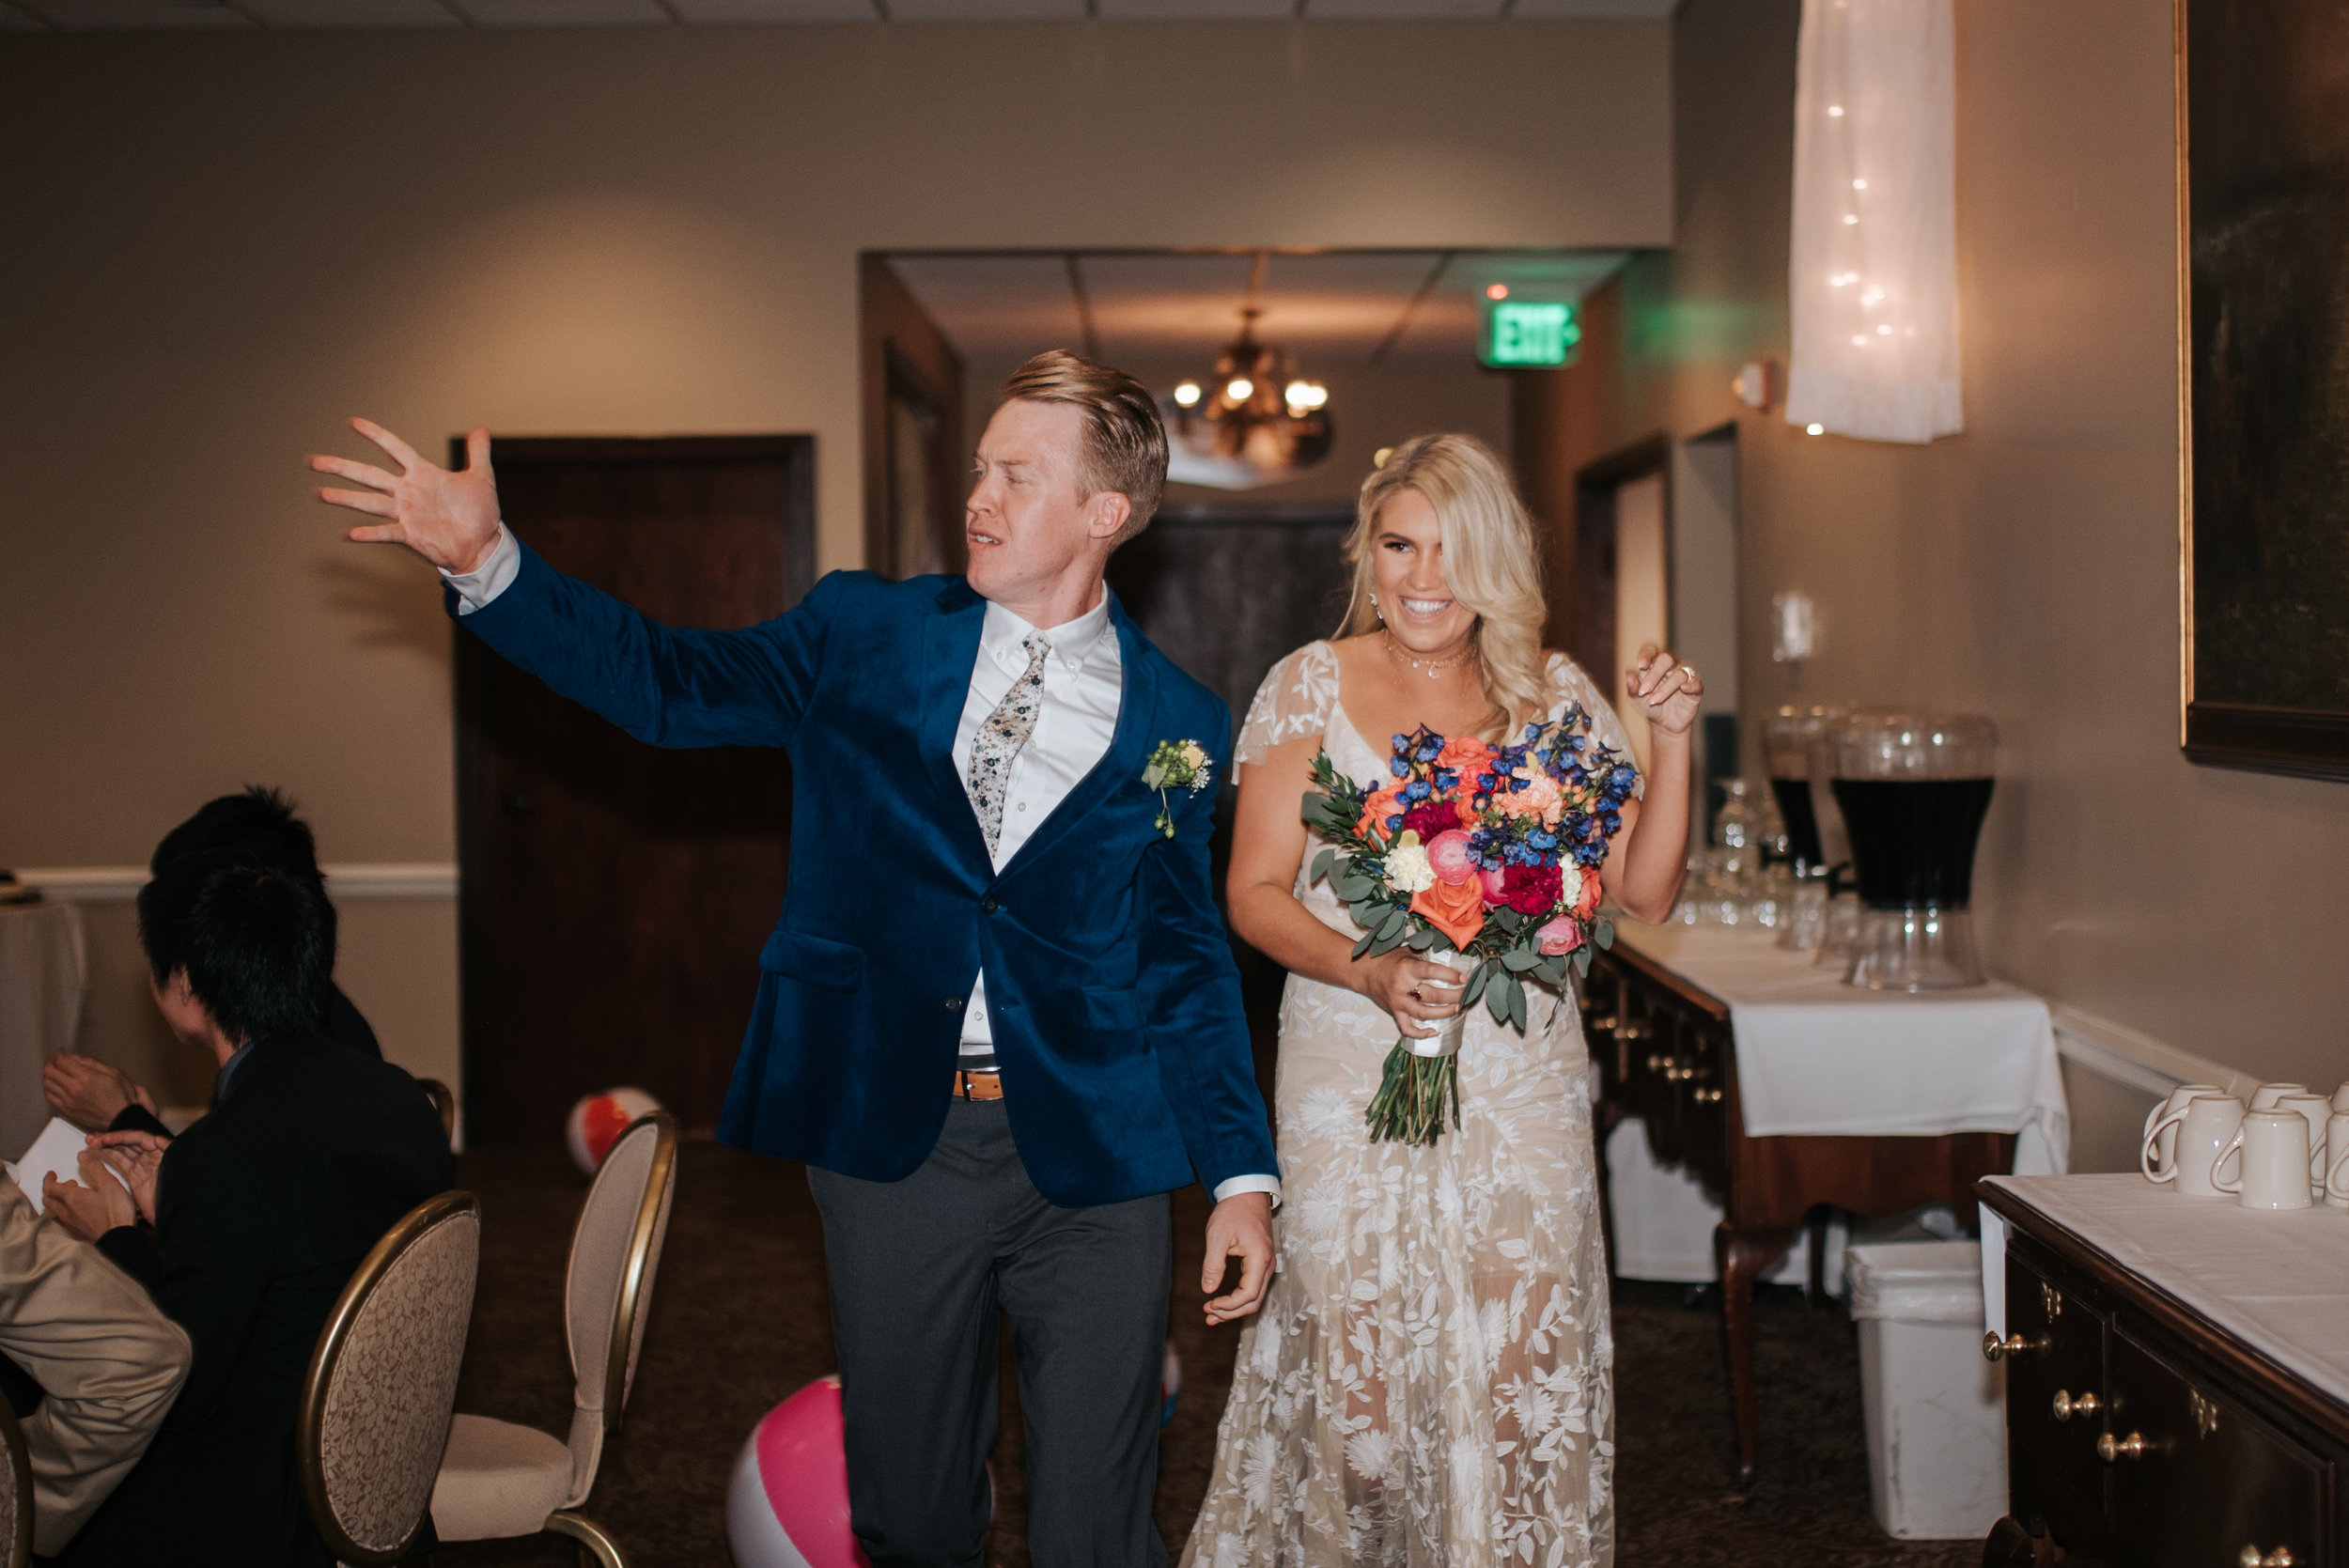 zayda-collin-panama-city-wedding-photography-trippy-bohemian-lisa-frank-wedding-dances-45.jpg